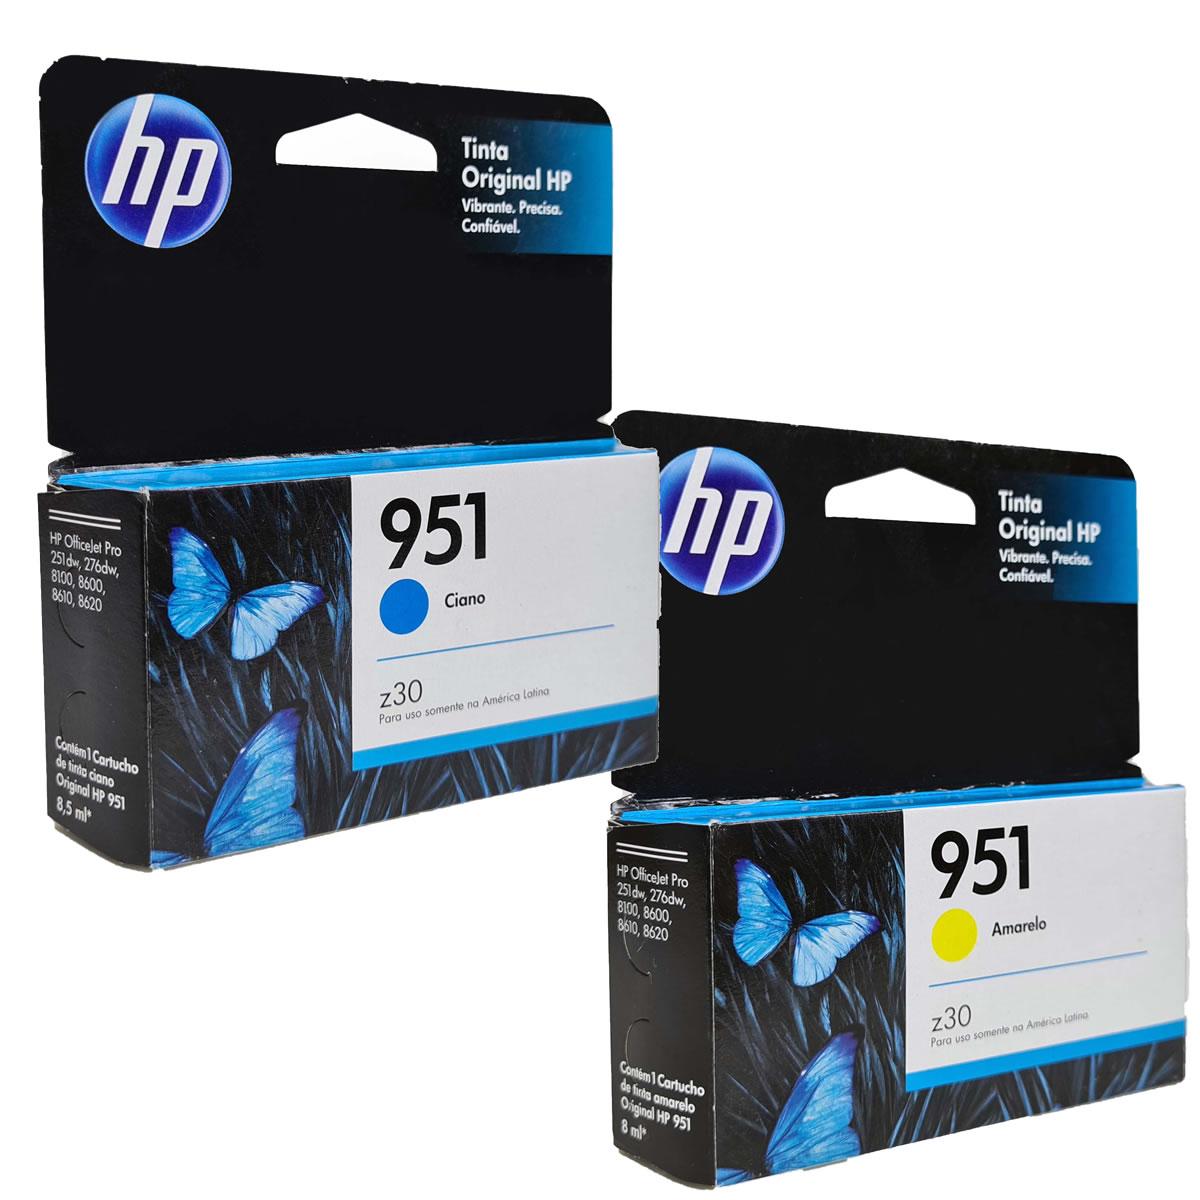 Kit 2 Cartuchos HP951 Ciano Amarelo para HP Officejet 8100 8600 8610